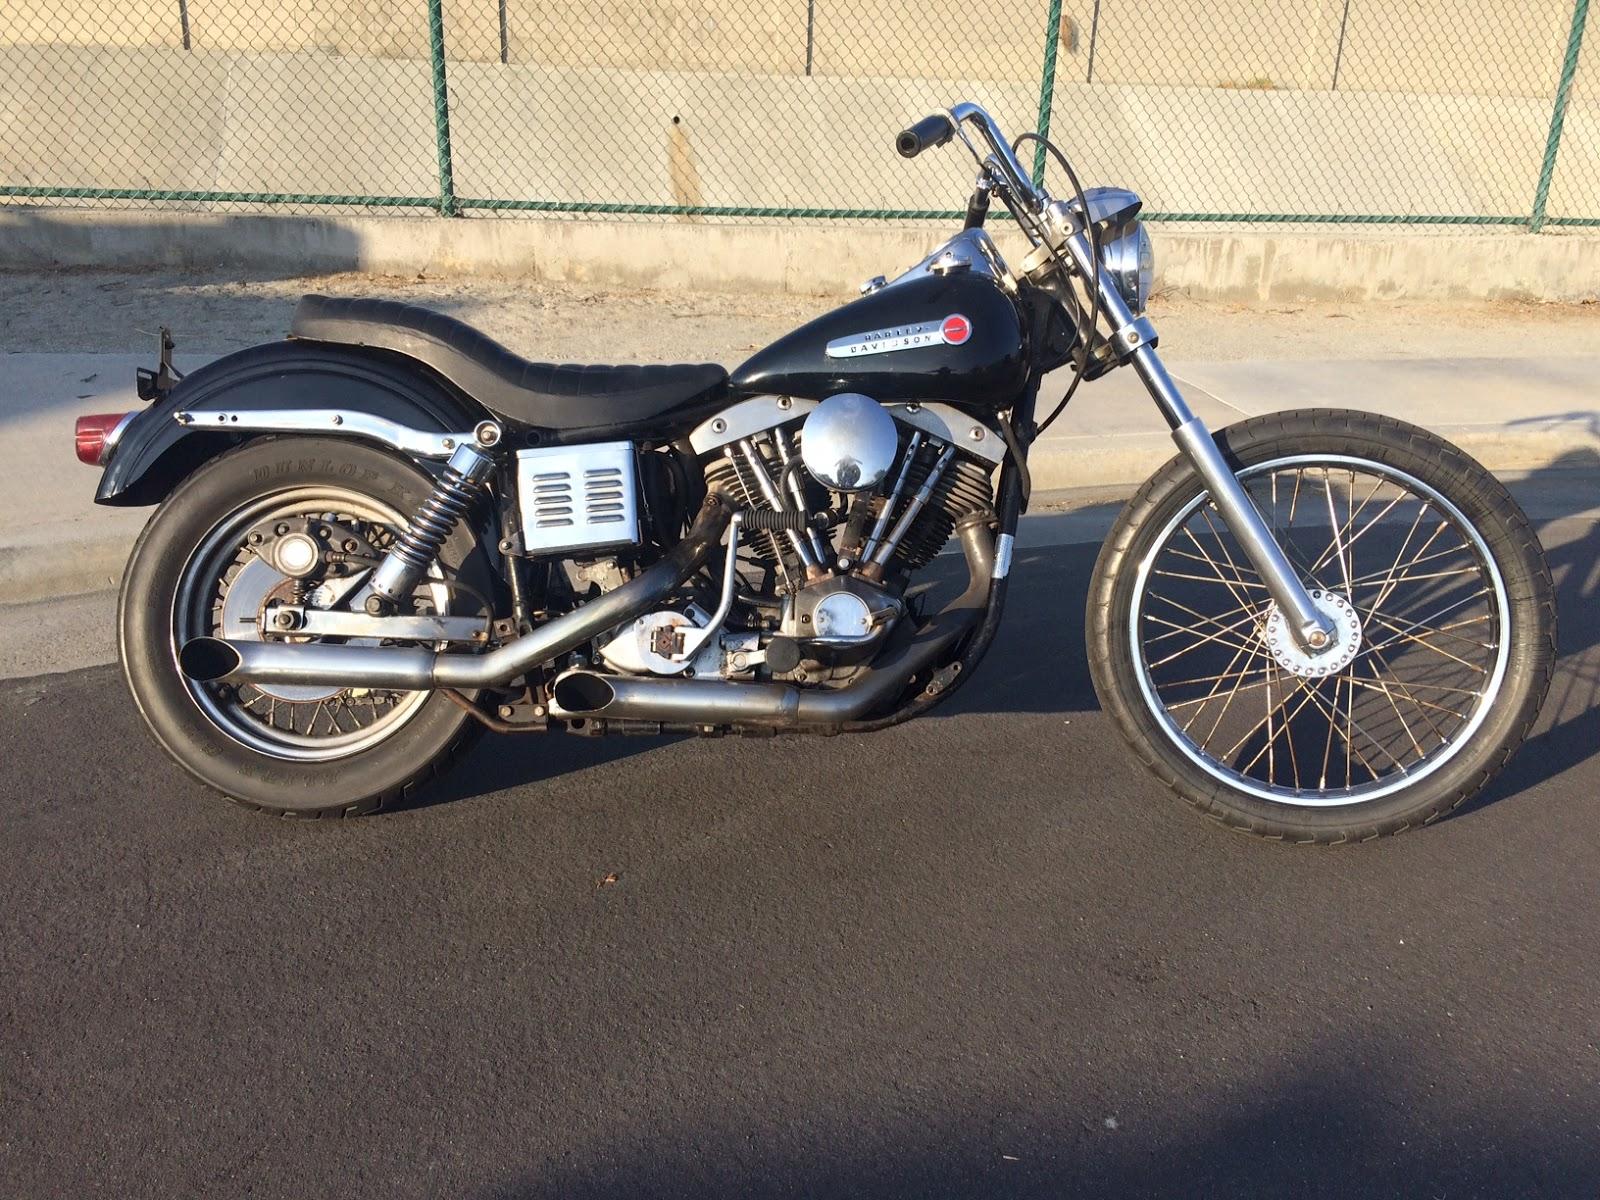 cycle zombies blog: For Sale** 1975 Harley shovelhead